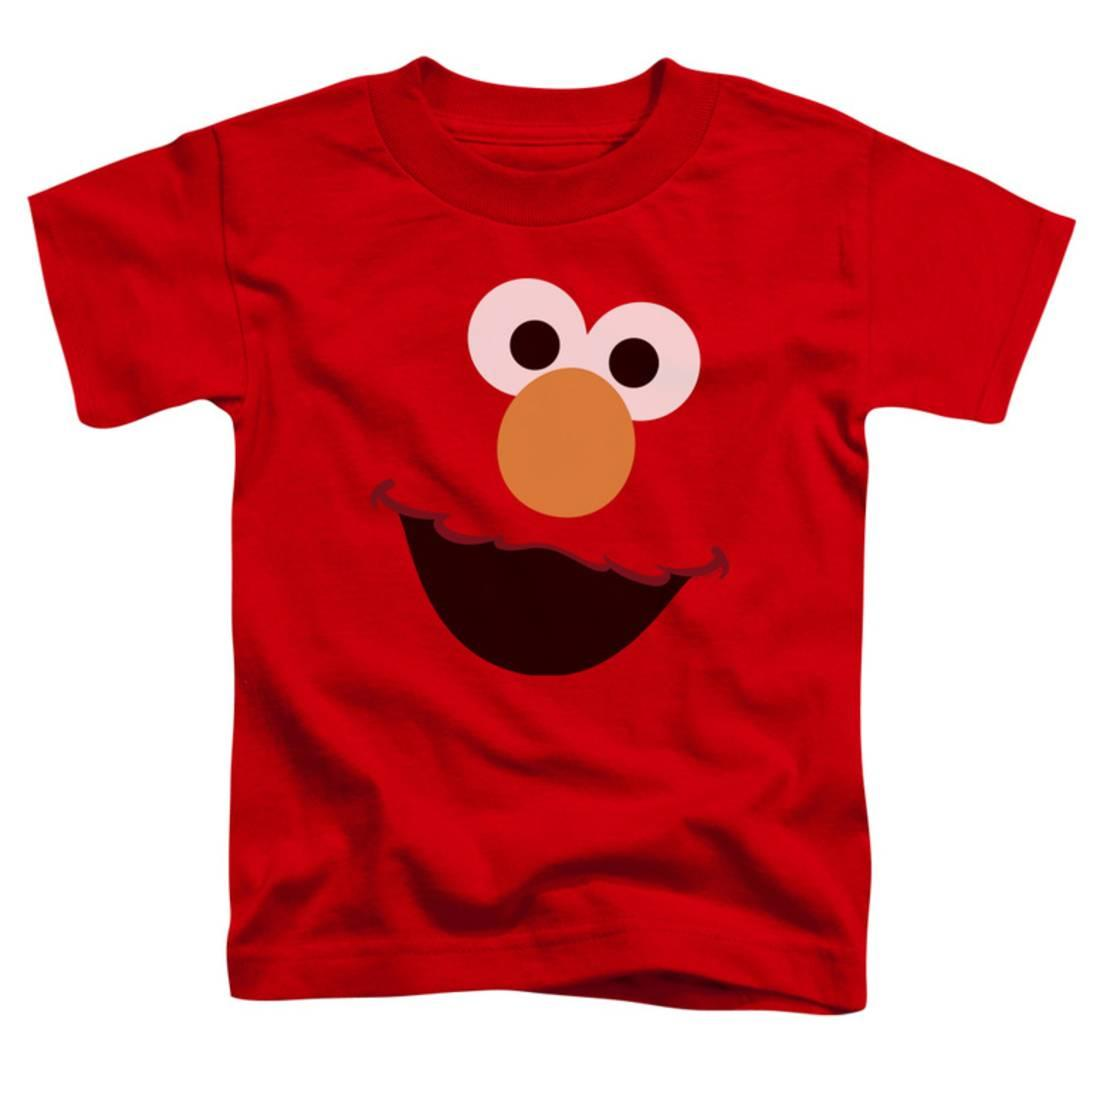 Toddler: Sesame Street- Big Elmo Face Apparel Baby T-Shirt - Red